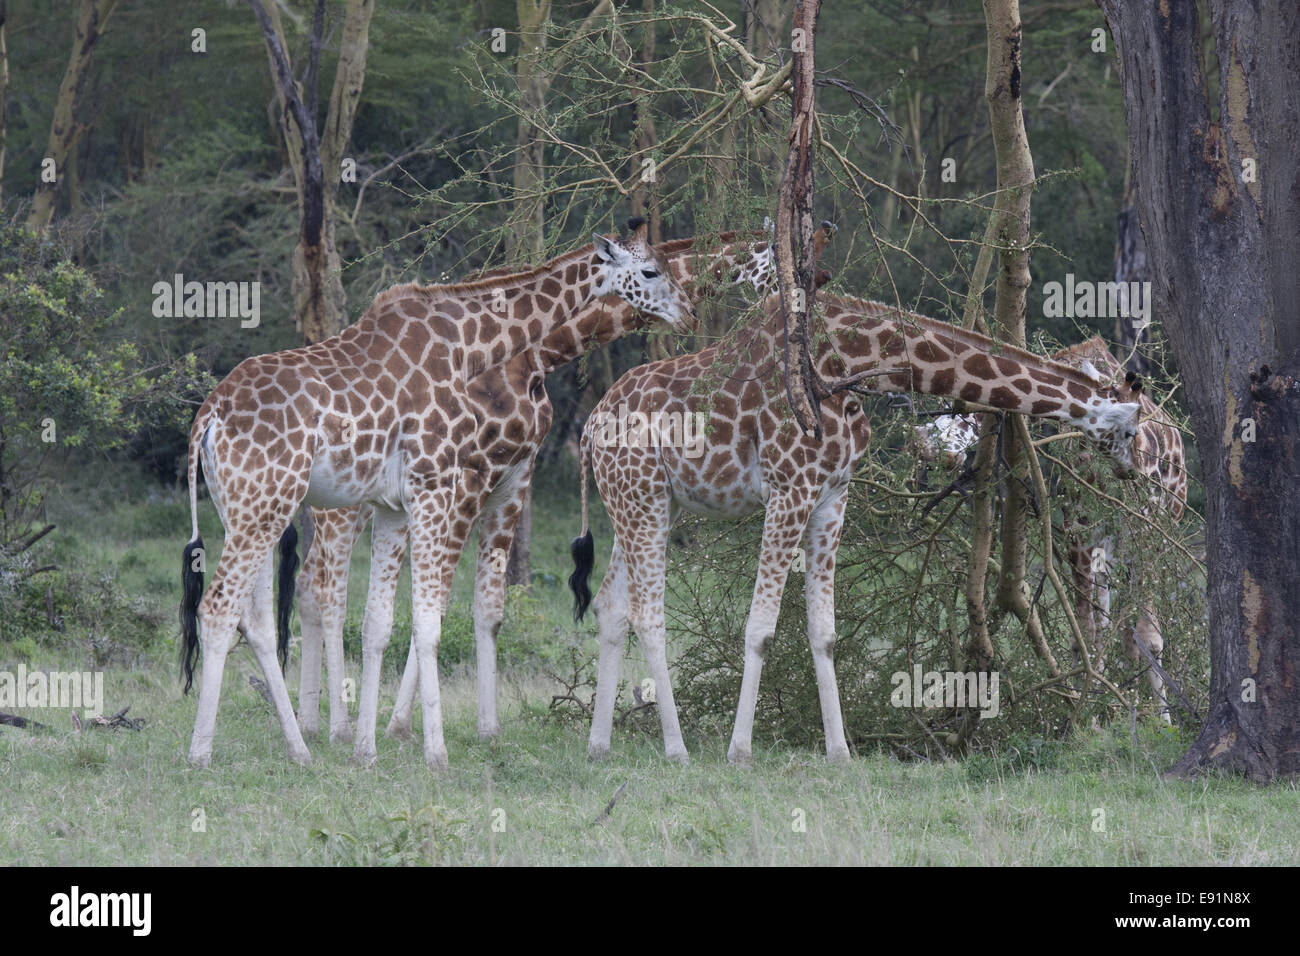 Rothschild's Giraffe feeding - Stock Image